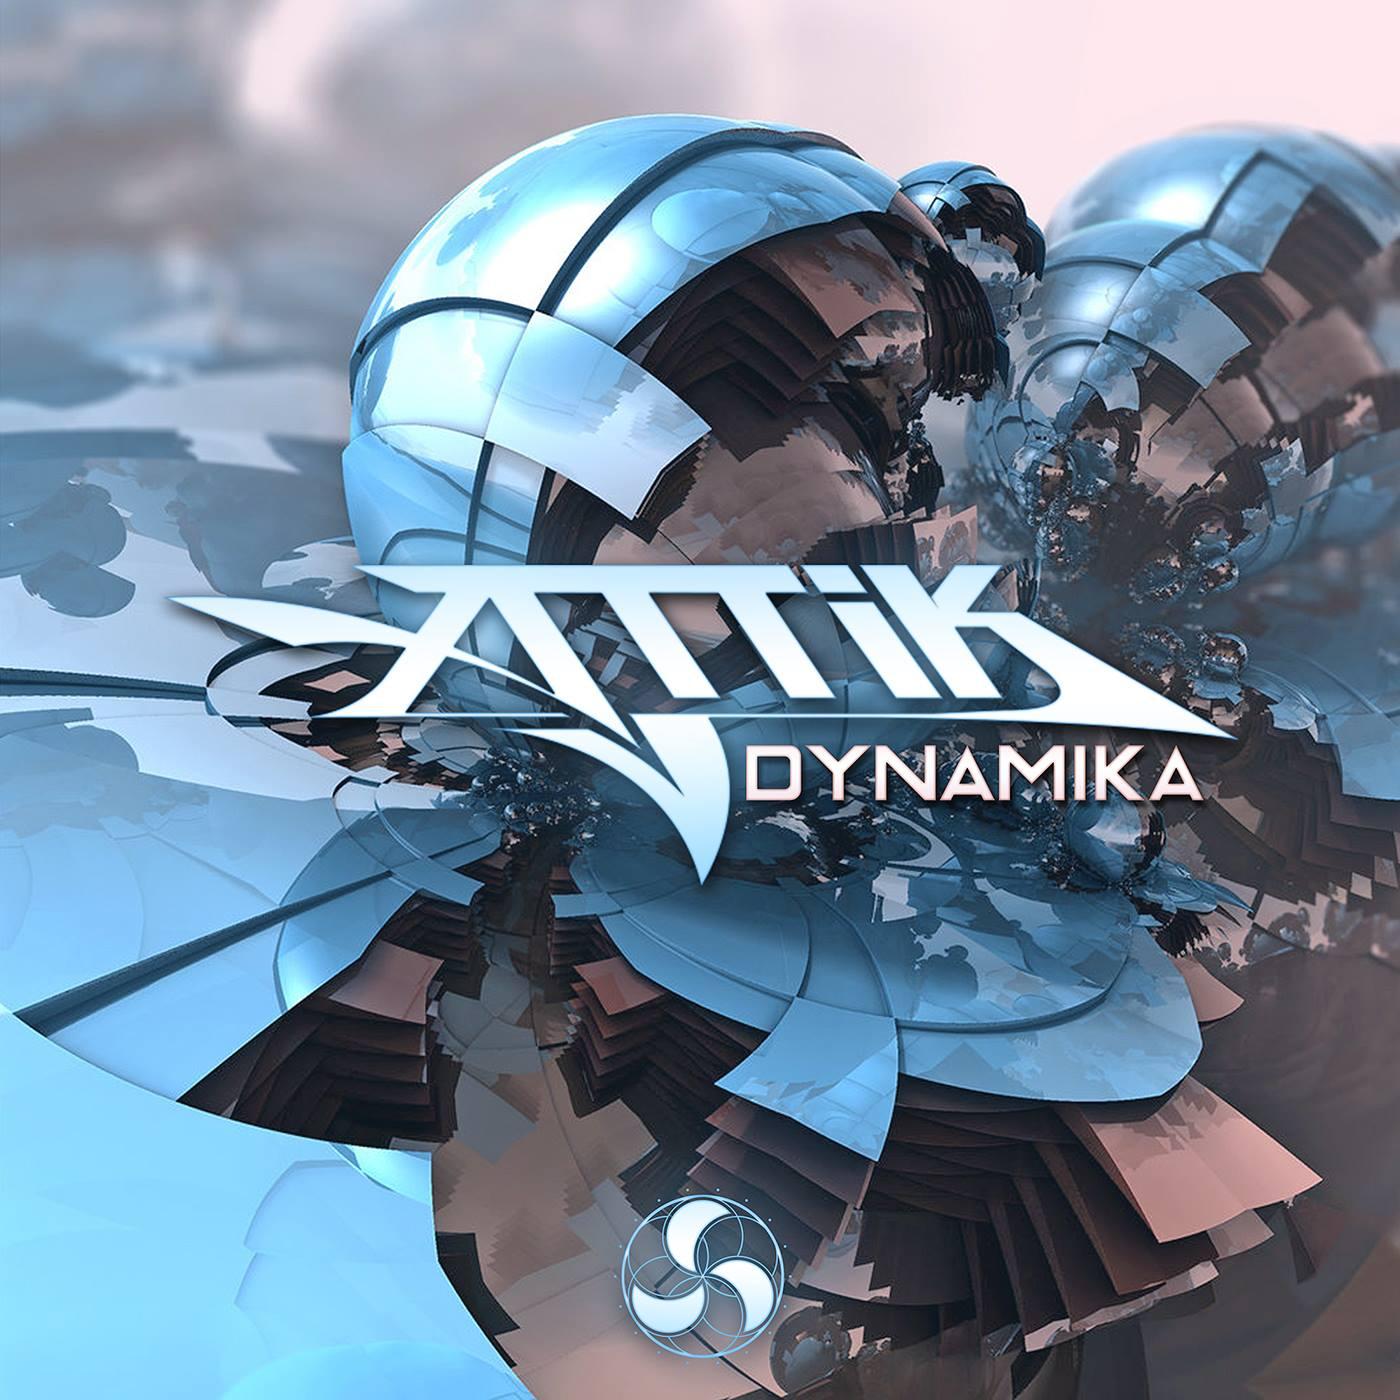 Attik - Dynamika